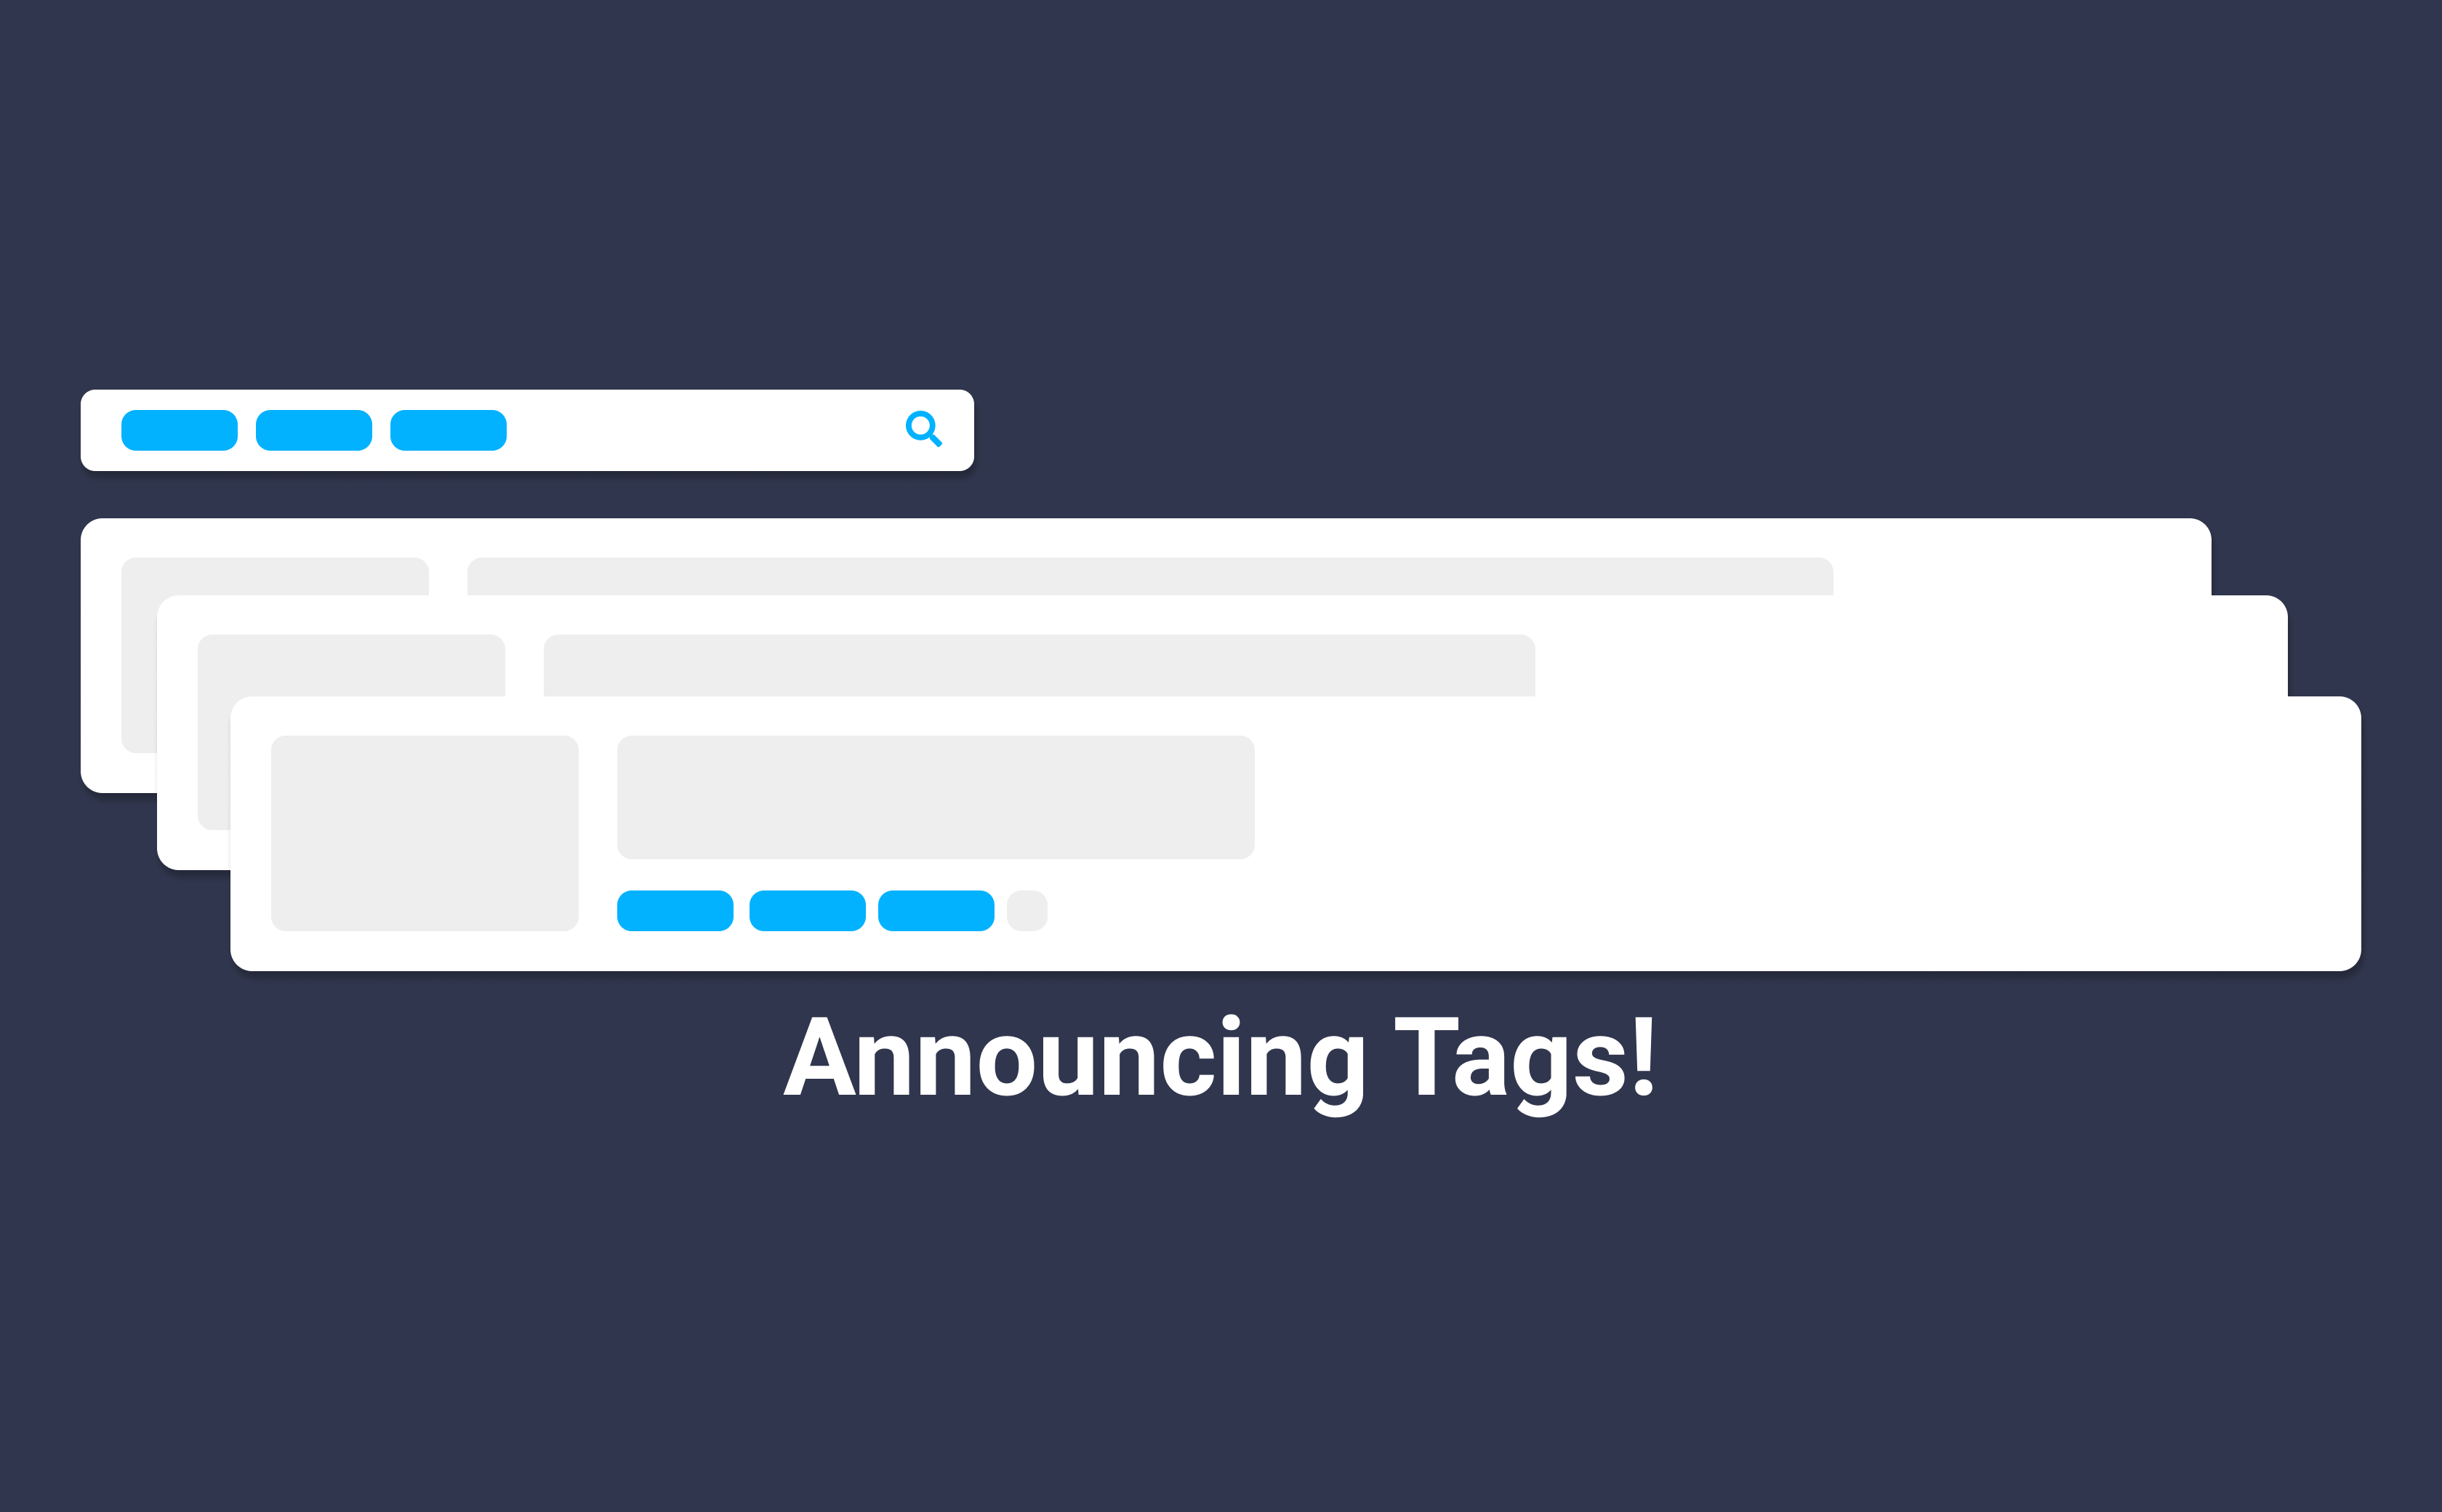 Enhanced Demo Organization: Announcing Tags in Demoflow 🎉